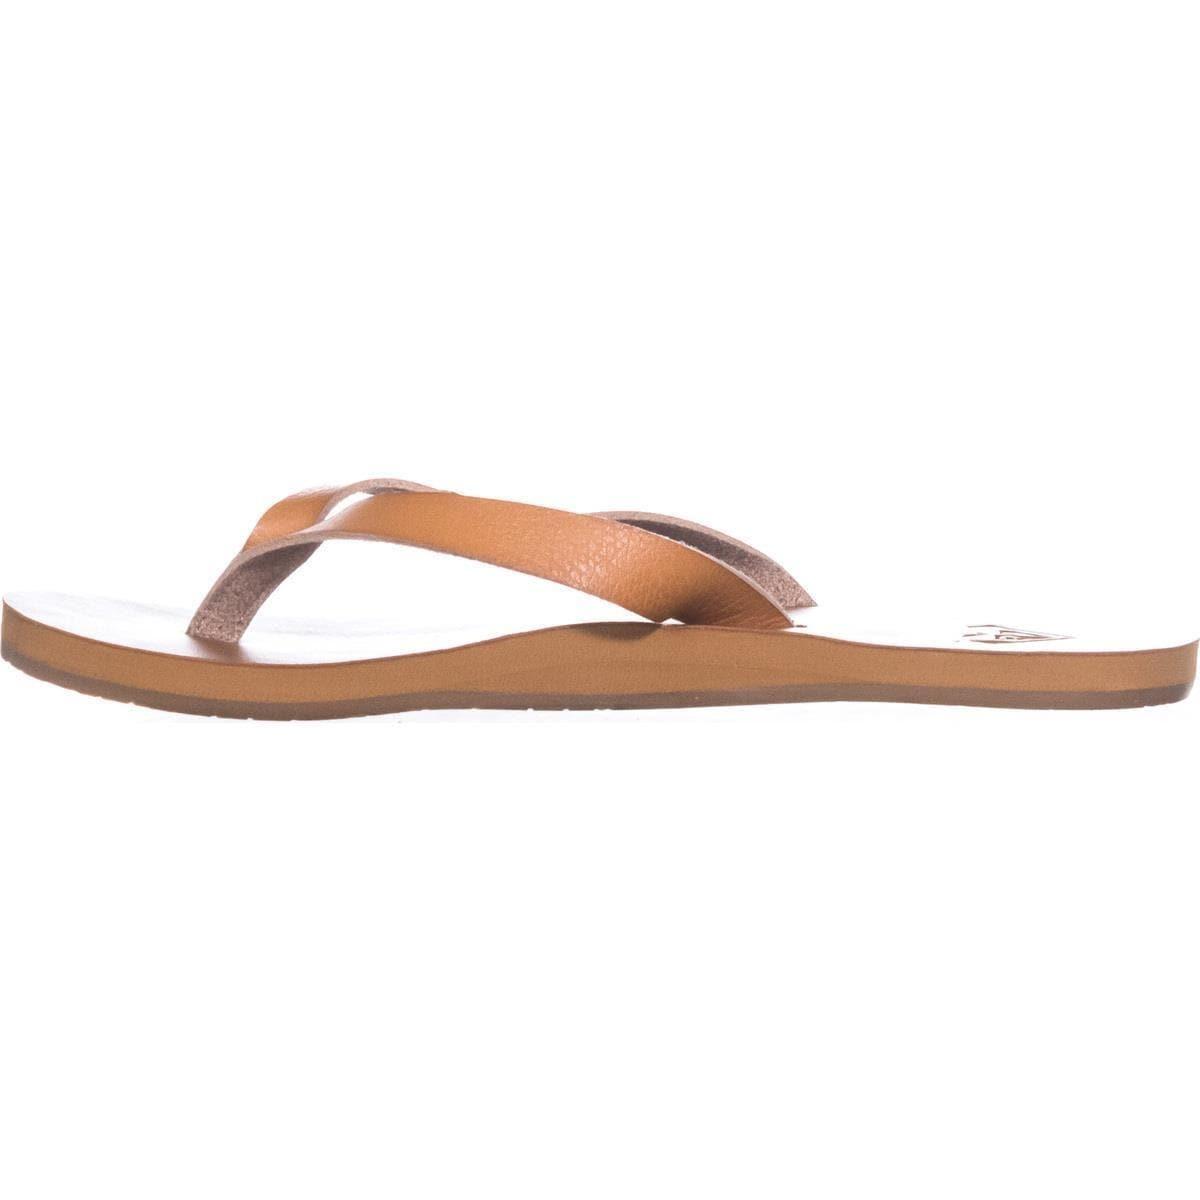 fd053d0c6be Shop Roxy Jyll Classic Casual Flat Flip Flops